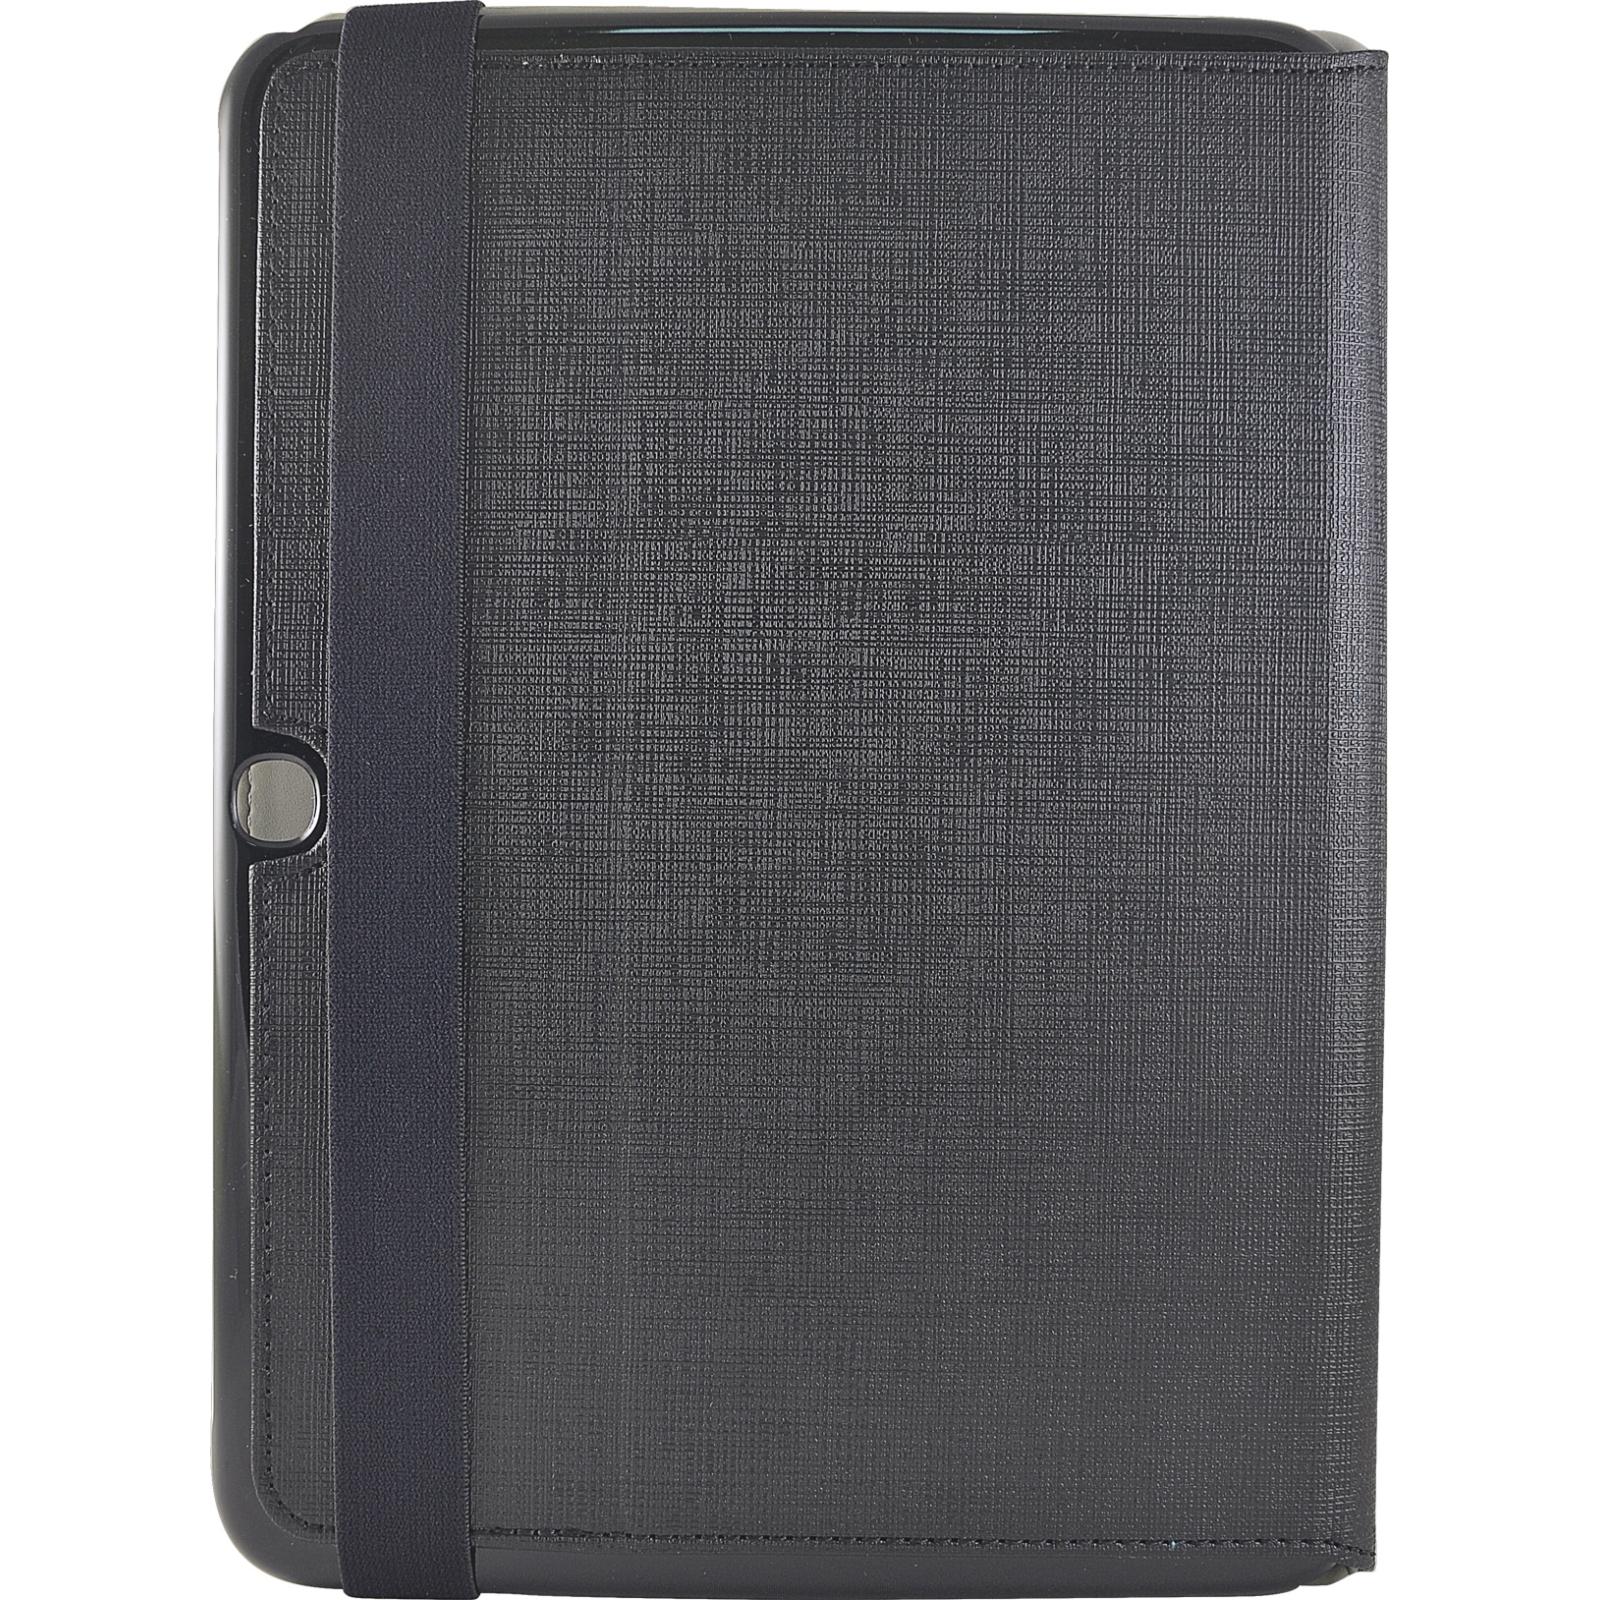 "Чехол для планшета Rock Samsung Galaxy Tab3 10,1"" flexible series black (P5200-40186) изображение 2"